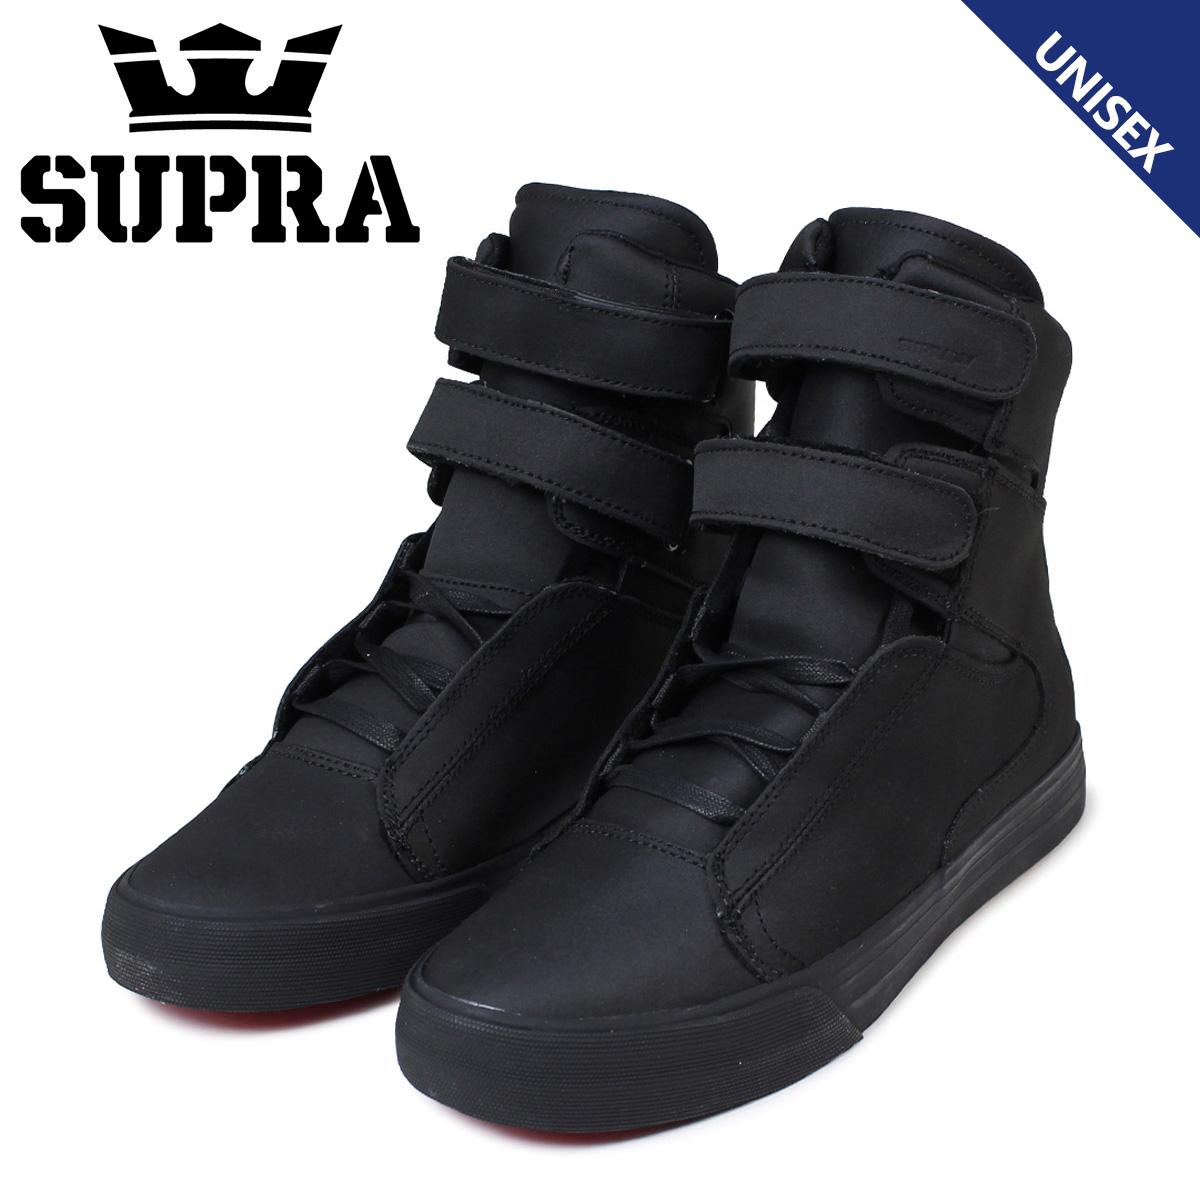 supra sneakers online shop, Männer Supra Skytop Schuhe Weiß